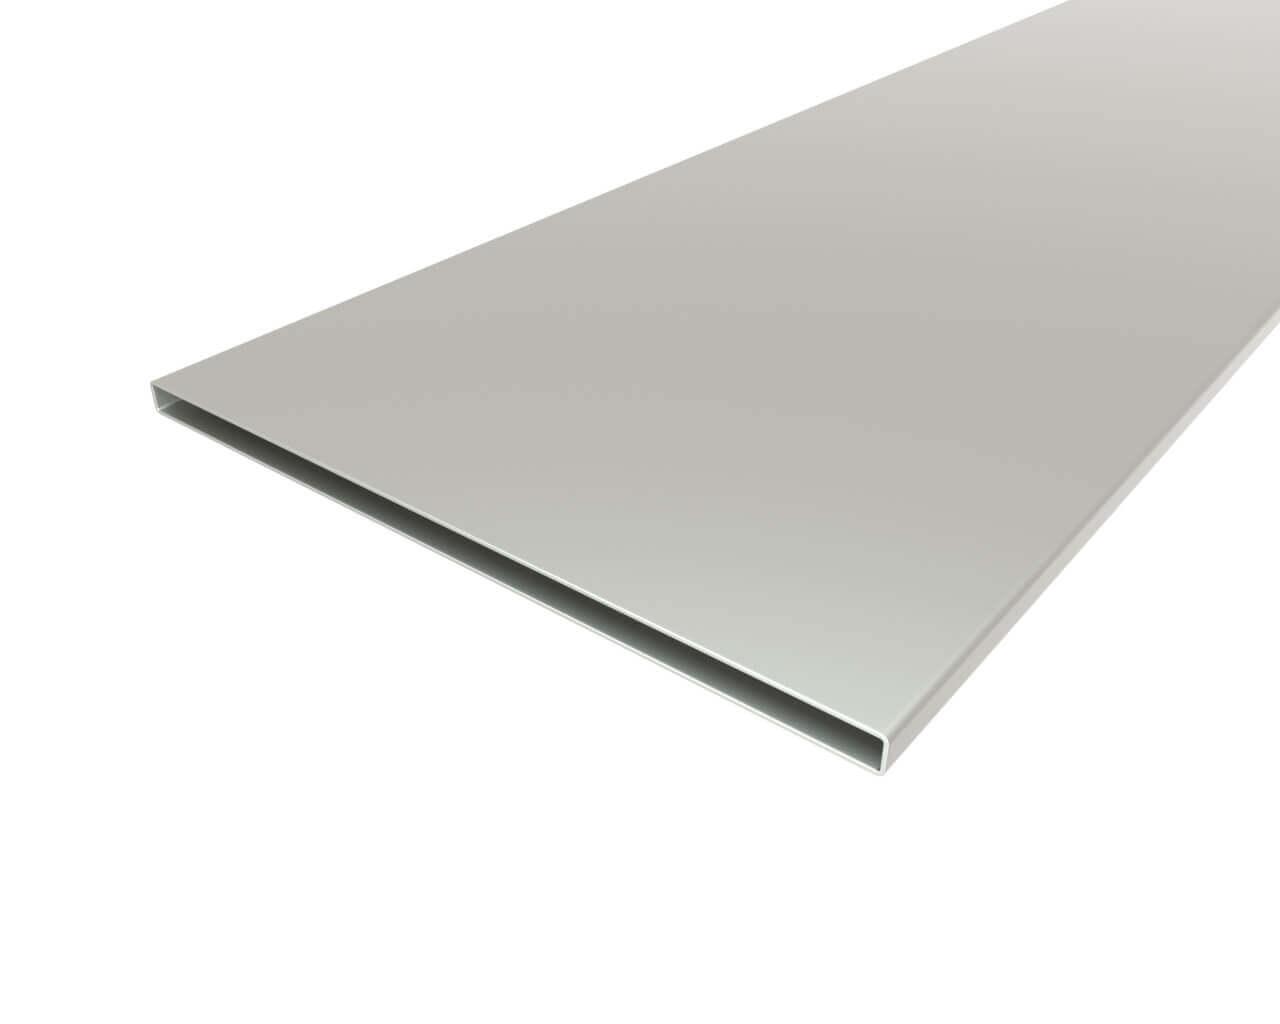 Алюминиевая пластина для ленты LC-AP-01640-2 anod<span class=